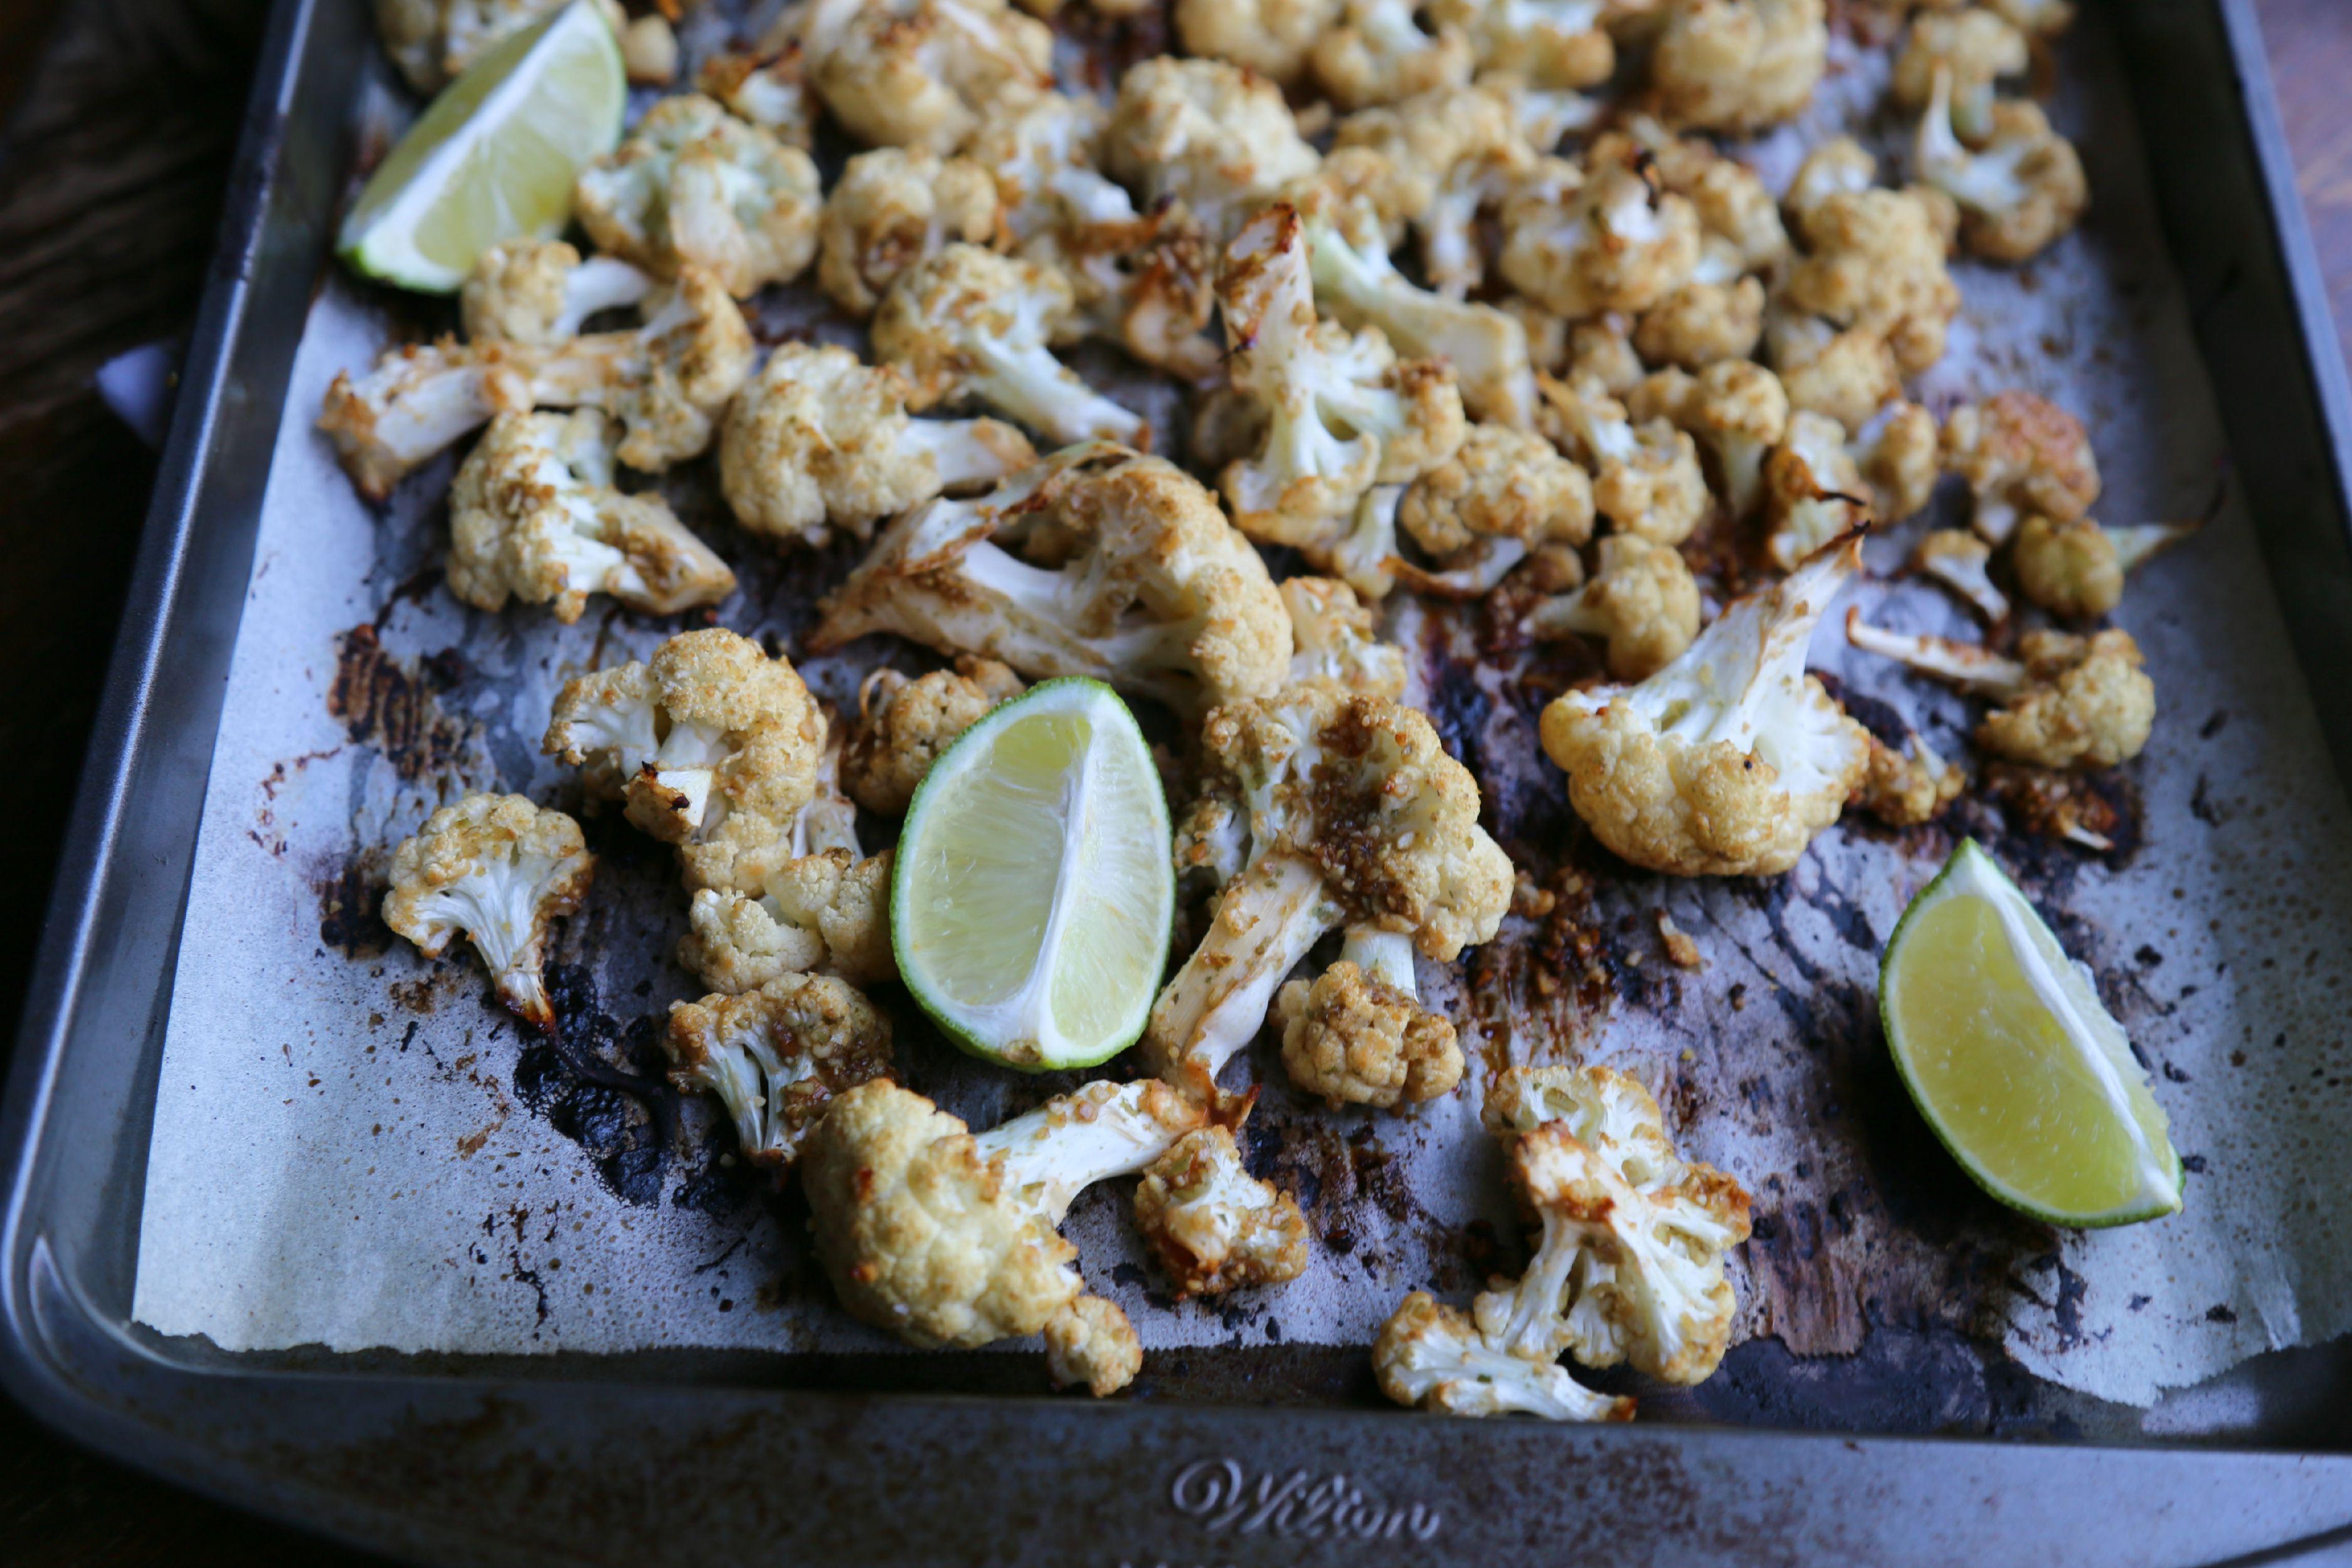 roasted-cauliflower-appetizer-kikkoman-vianeyrodriguez-sweetlifebake